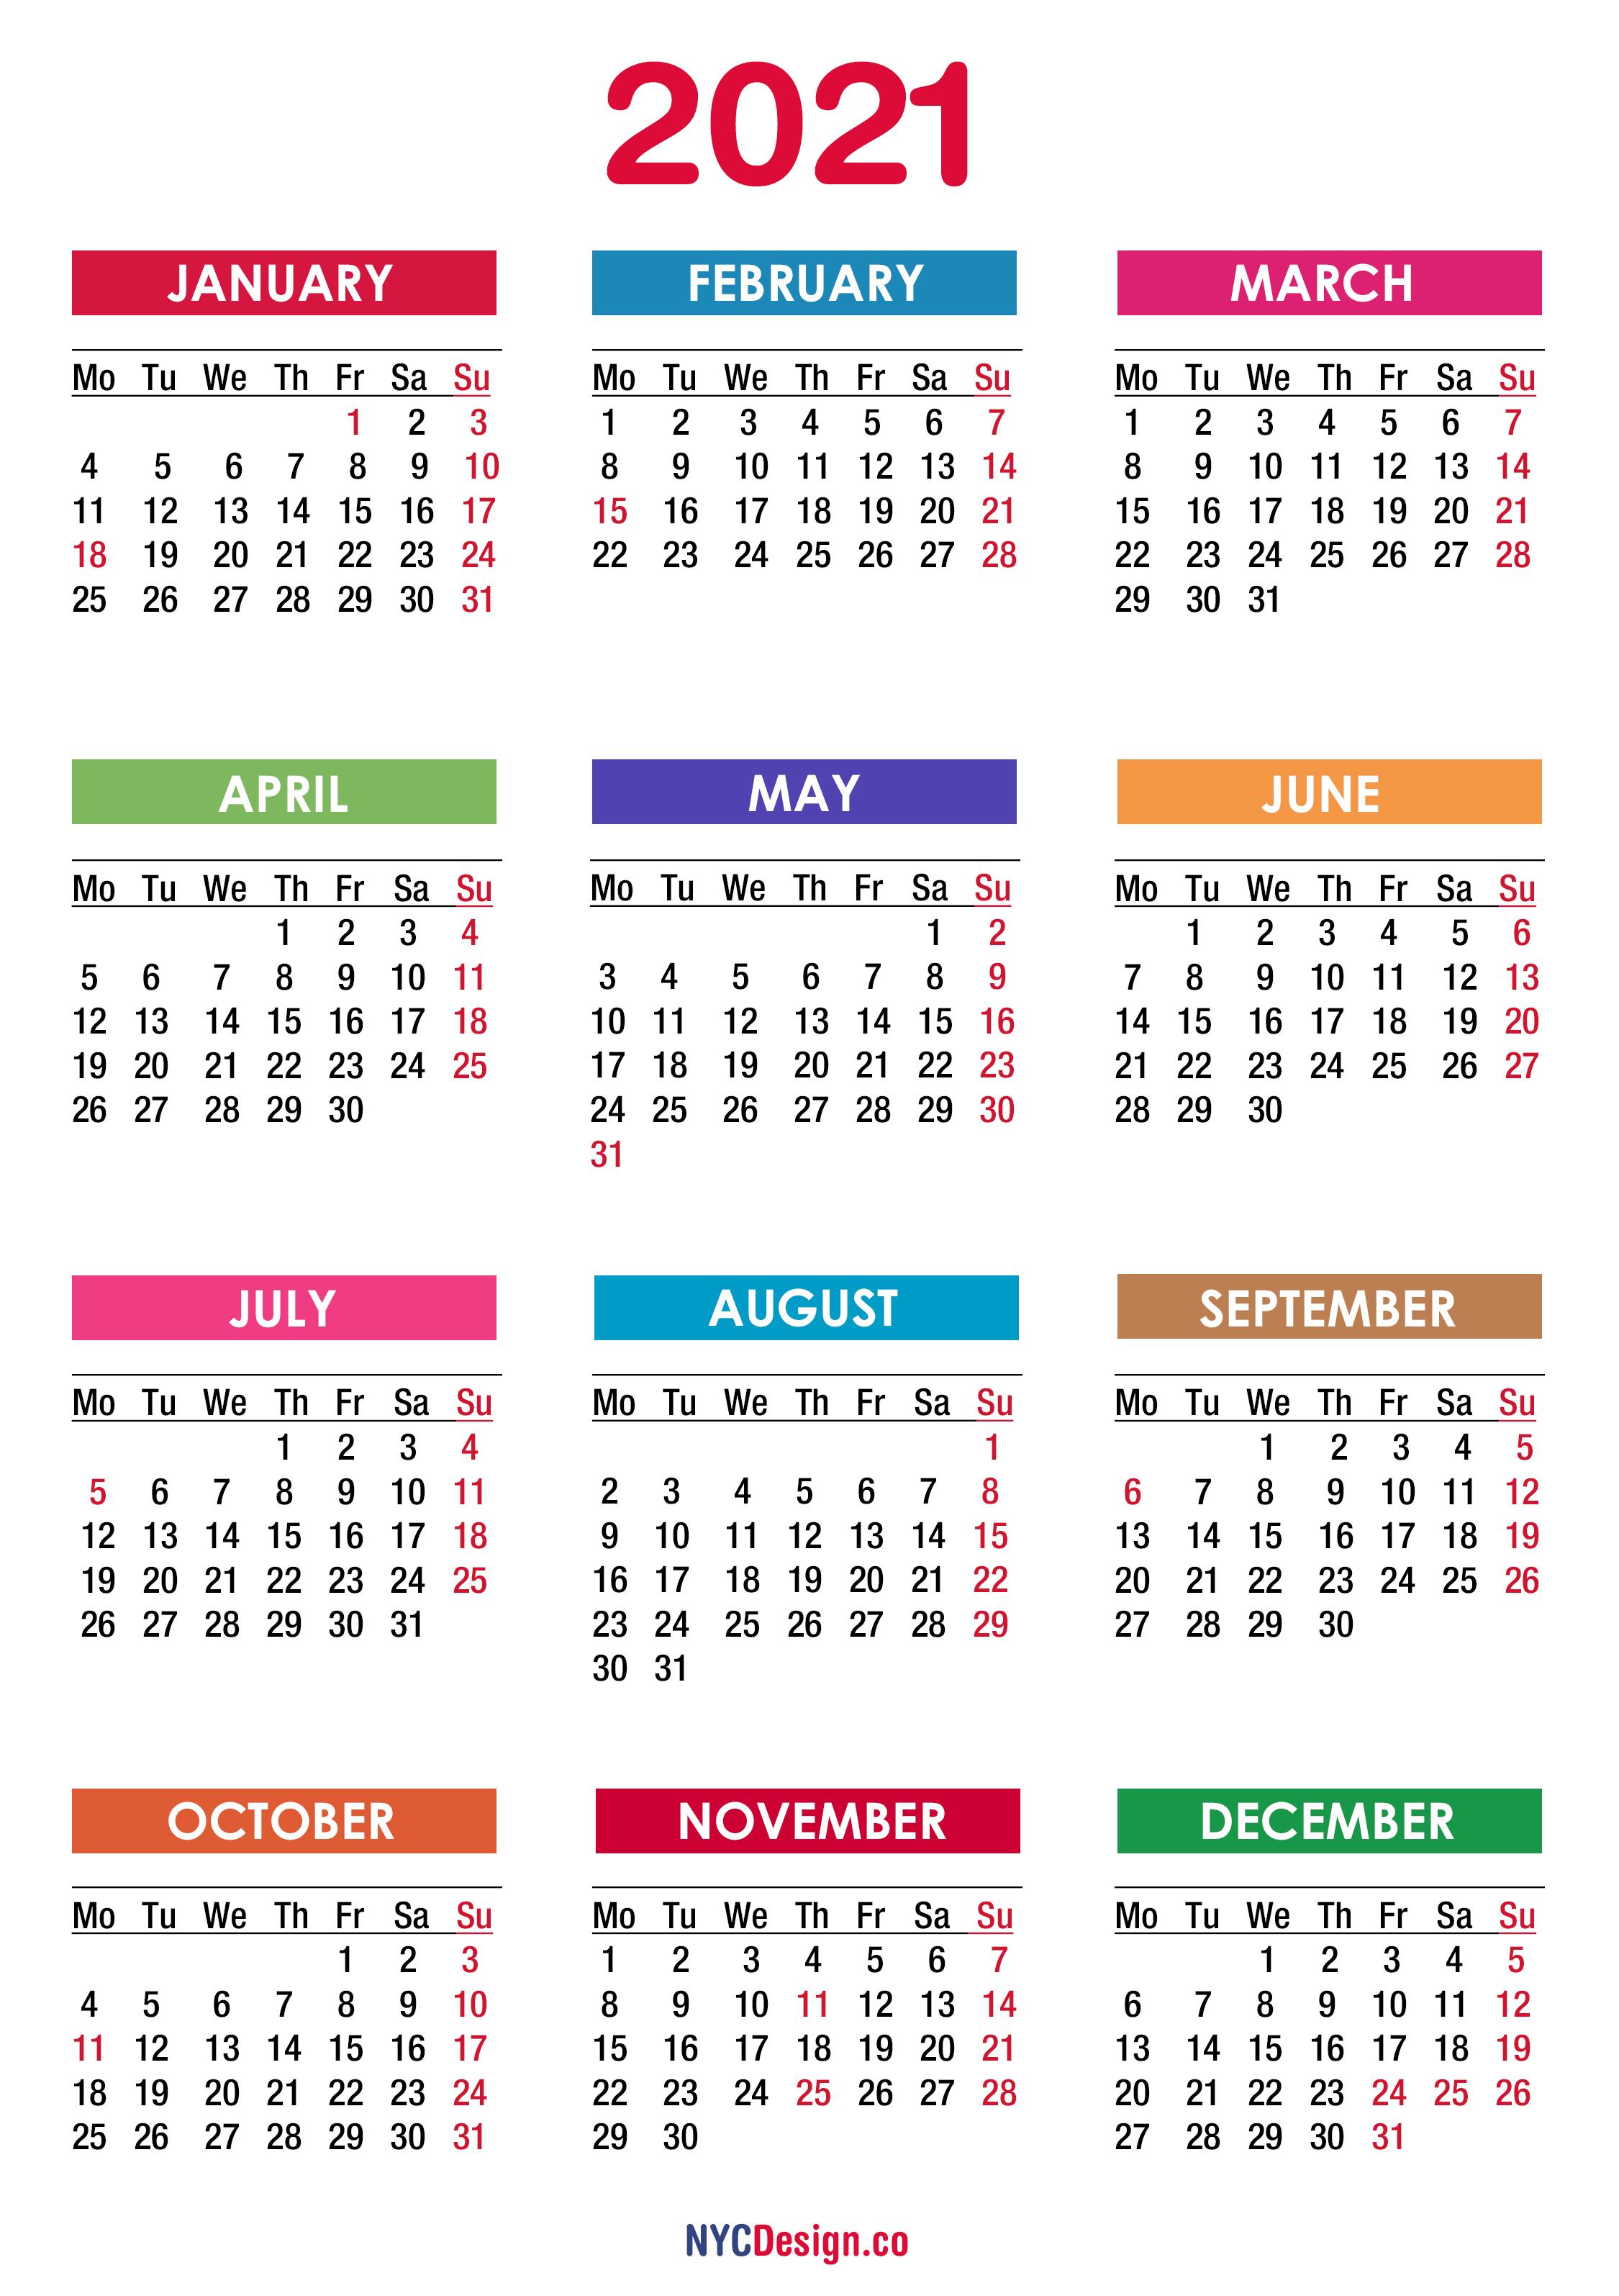 2021 Calendar With Holidays, Printable Free, Pdf, Colorful